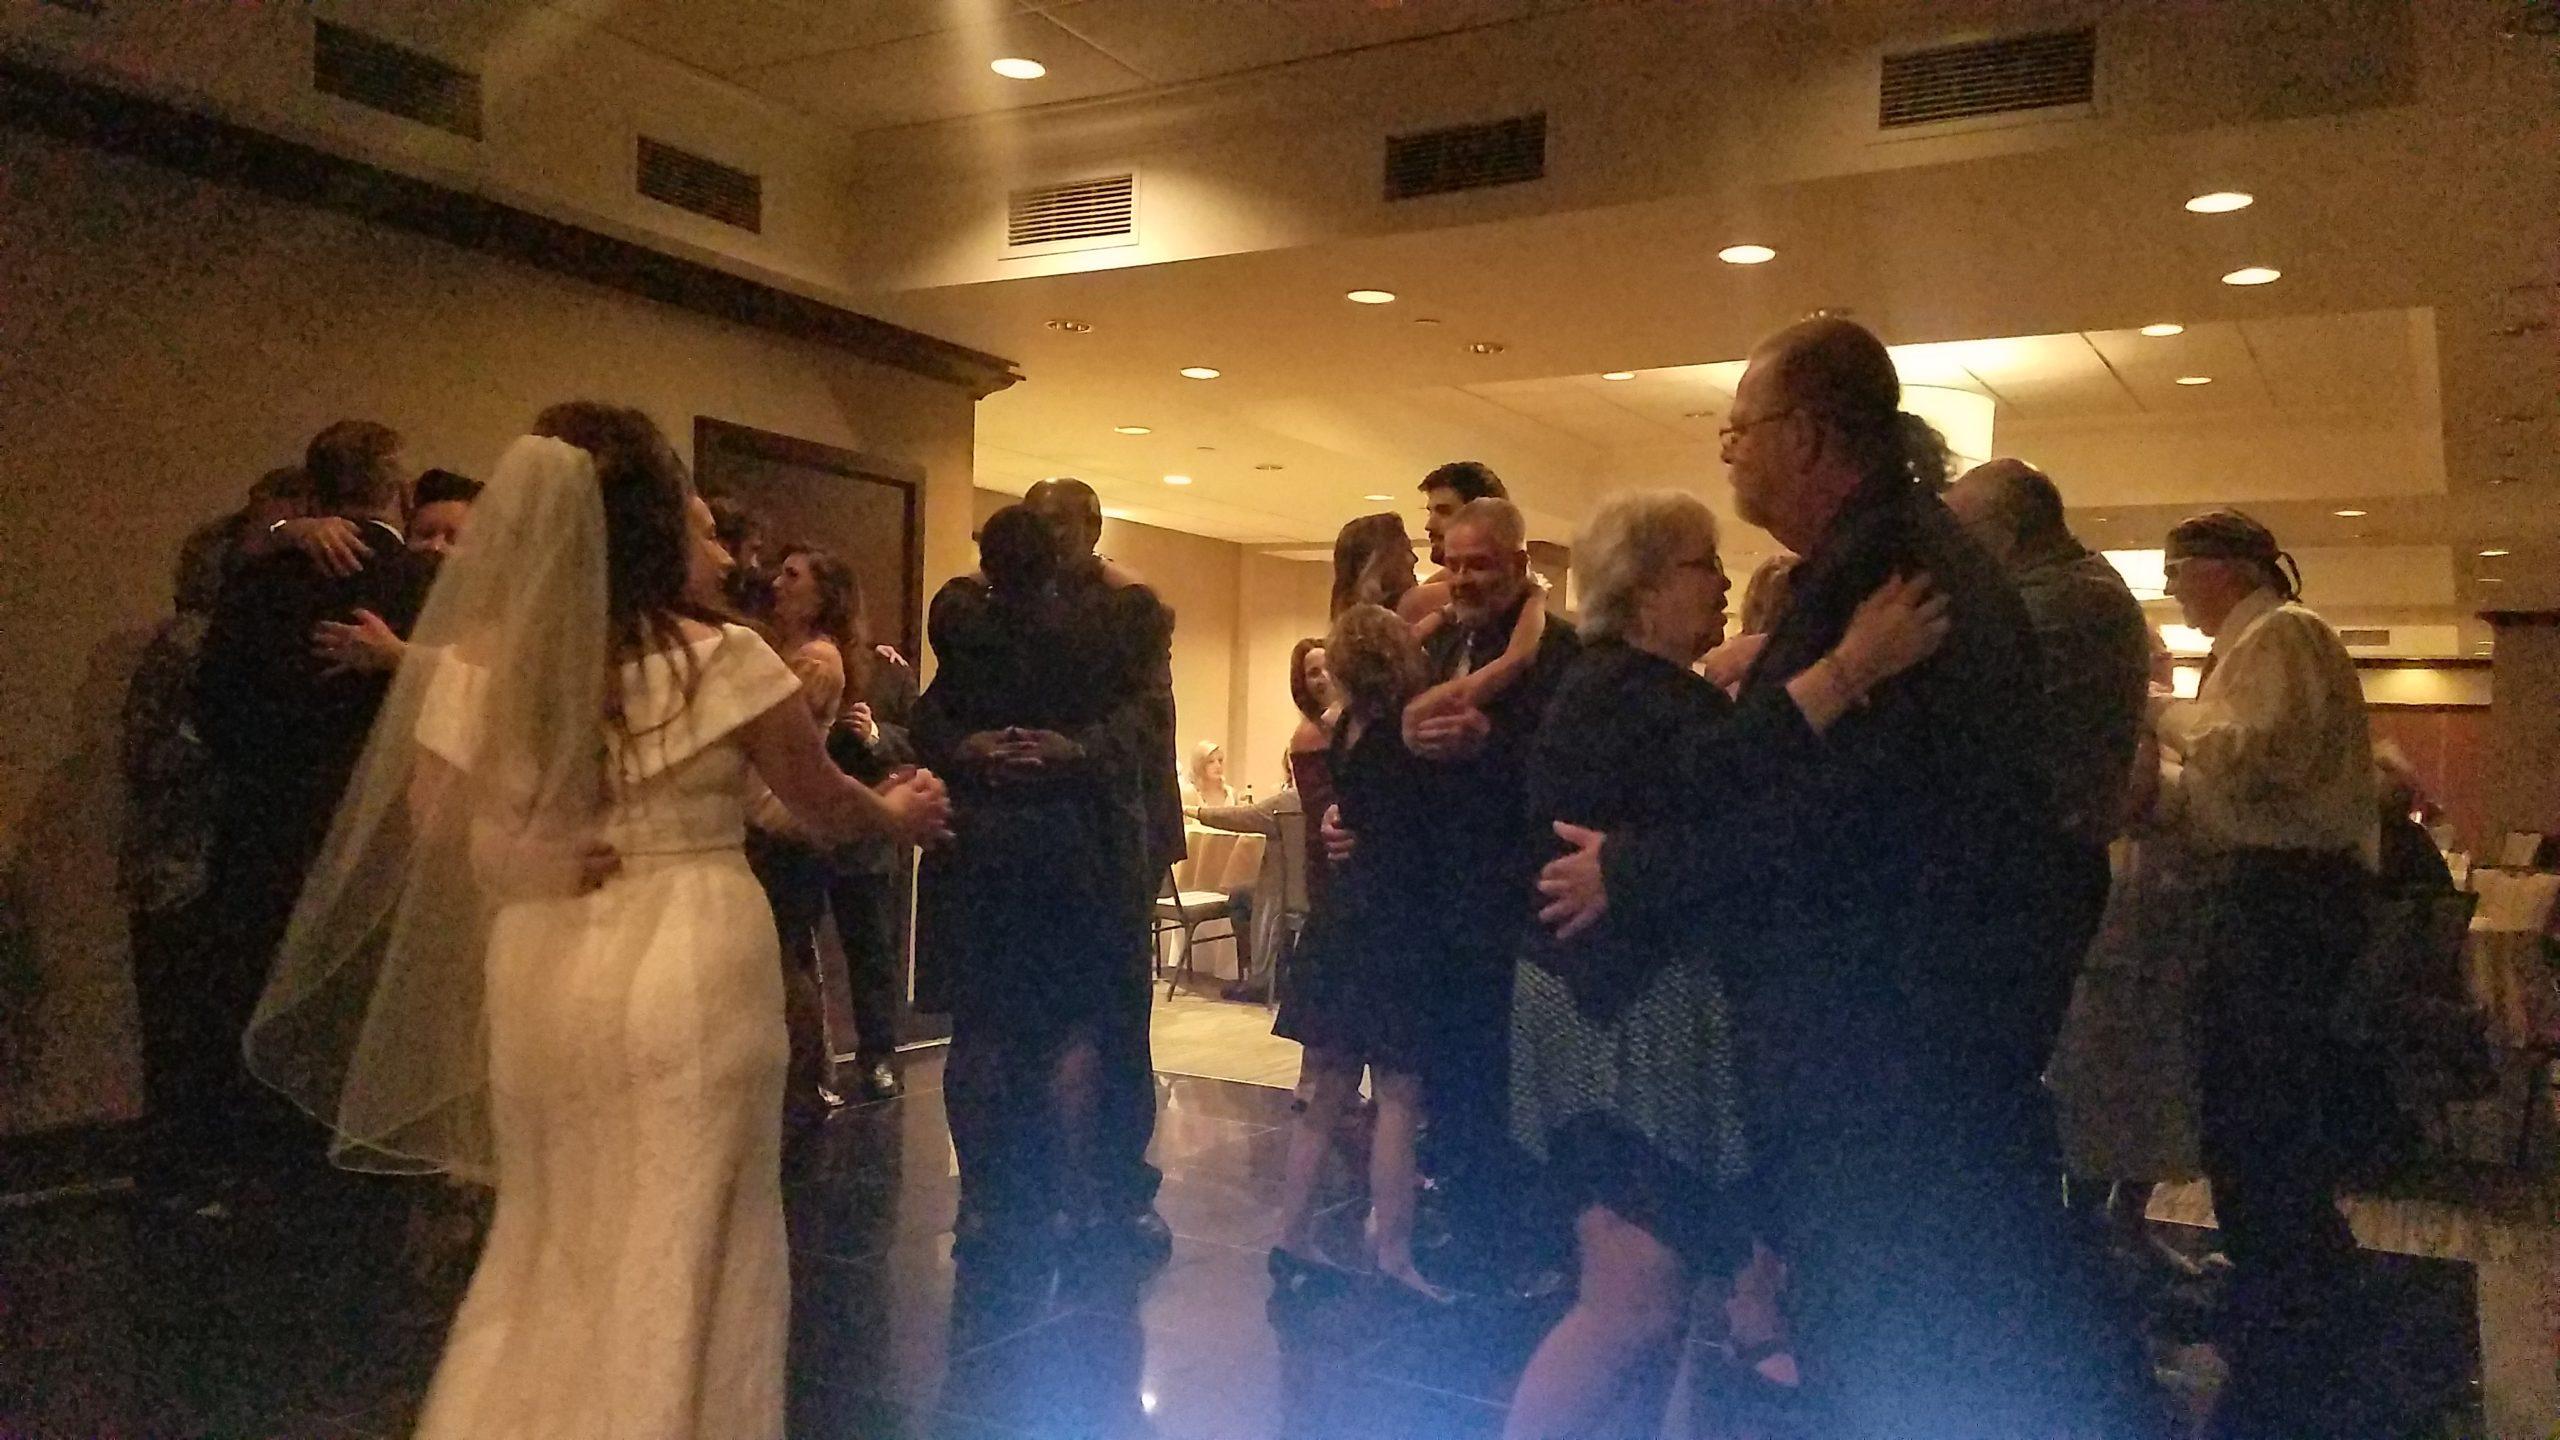 wedding dancing slow pic2